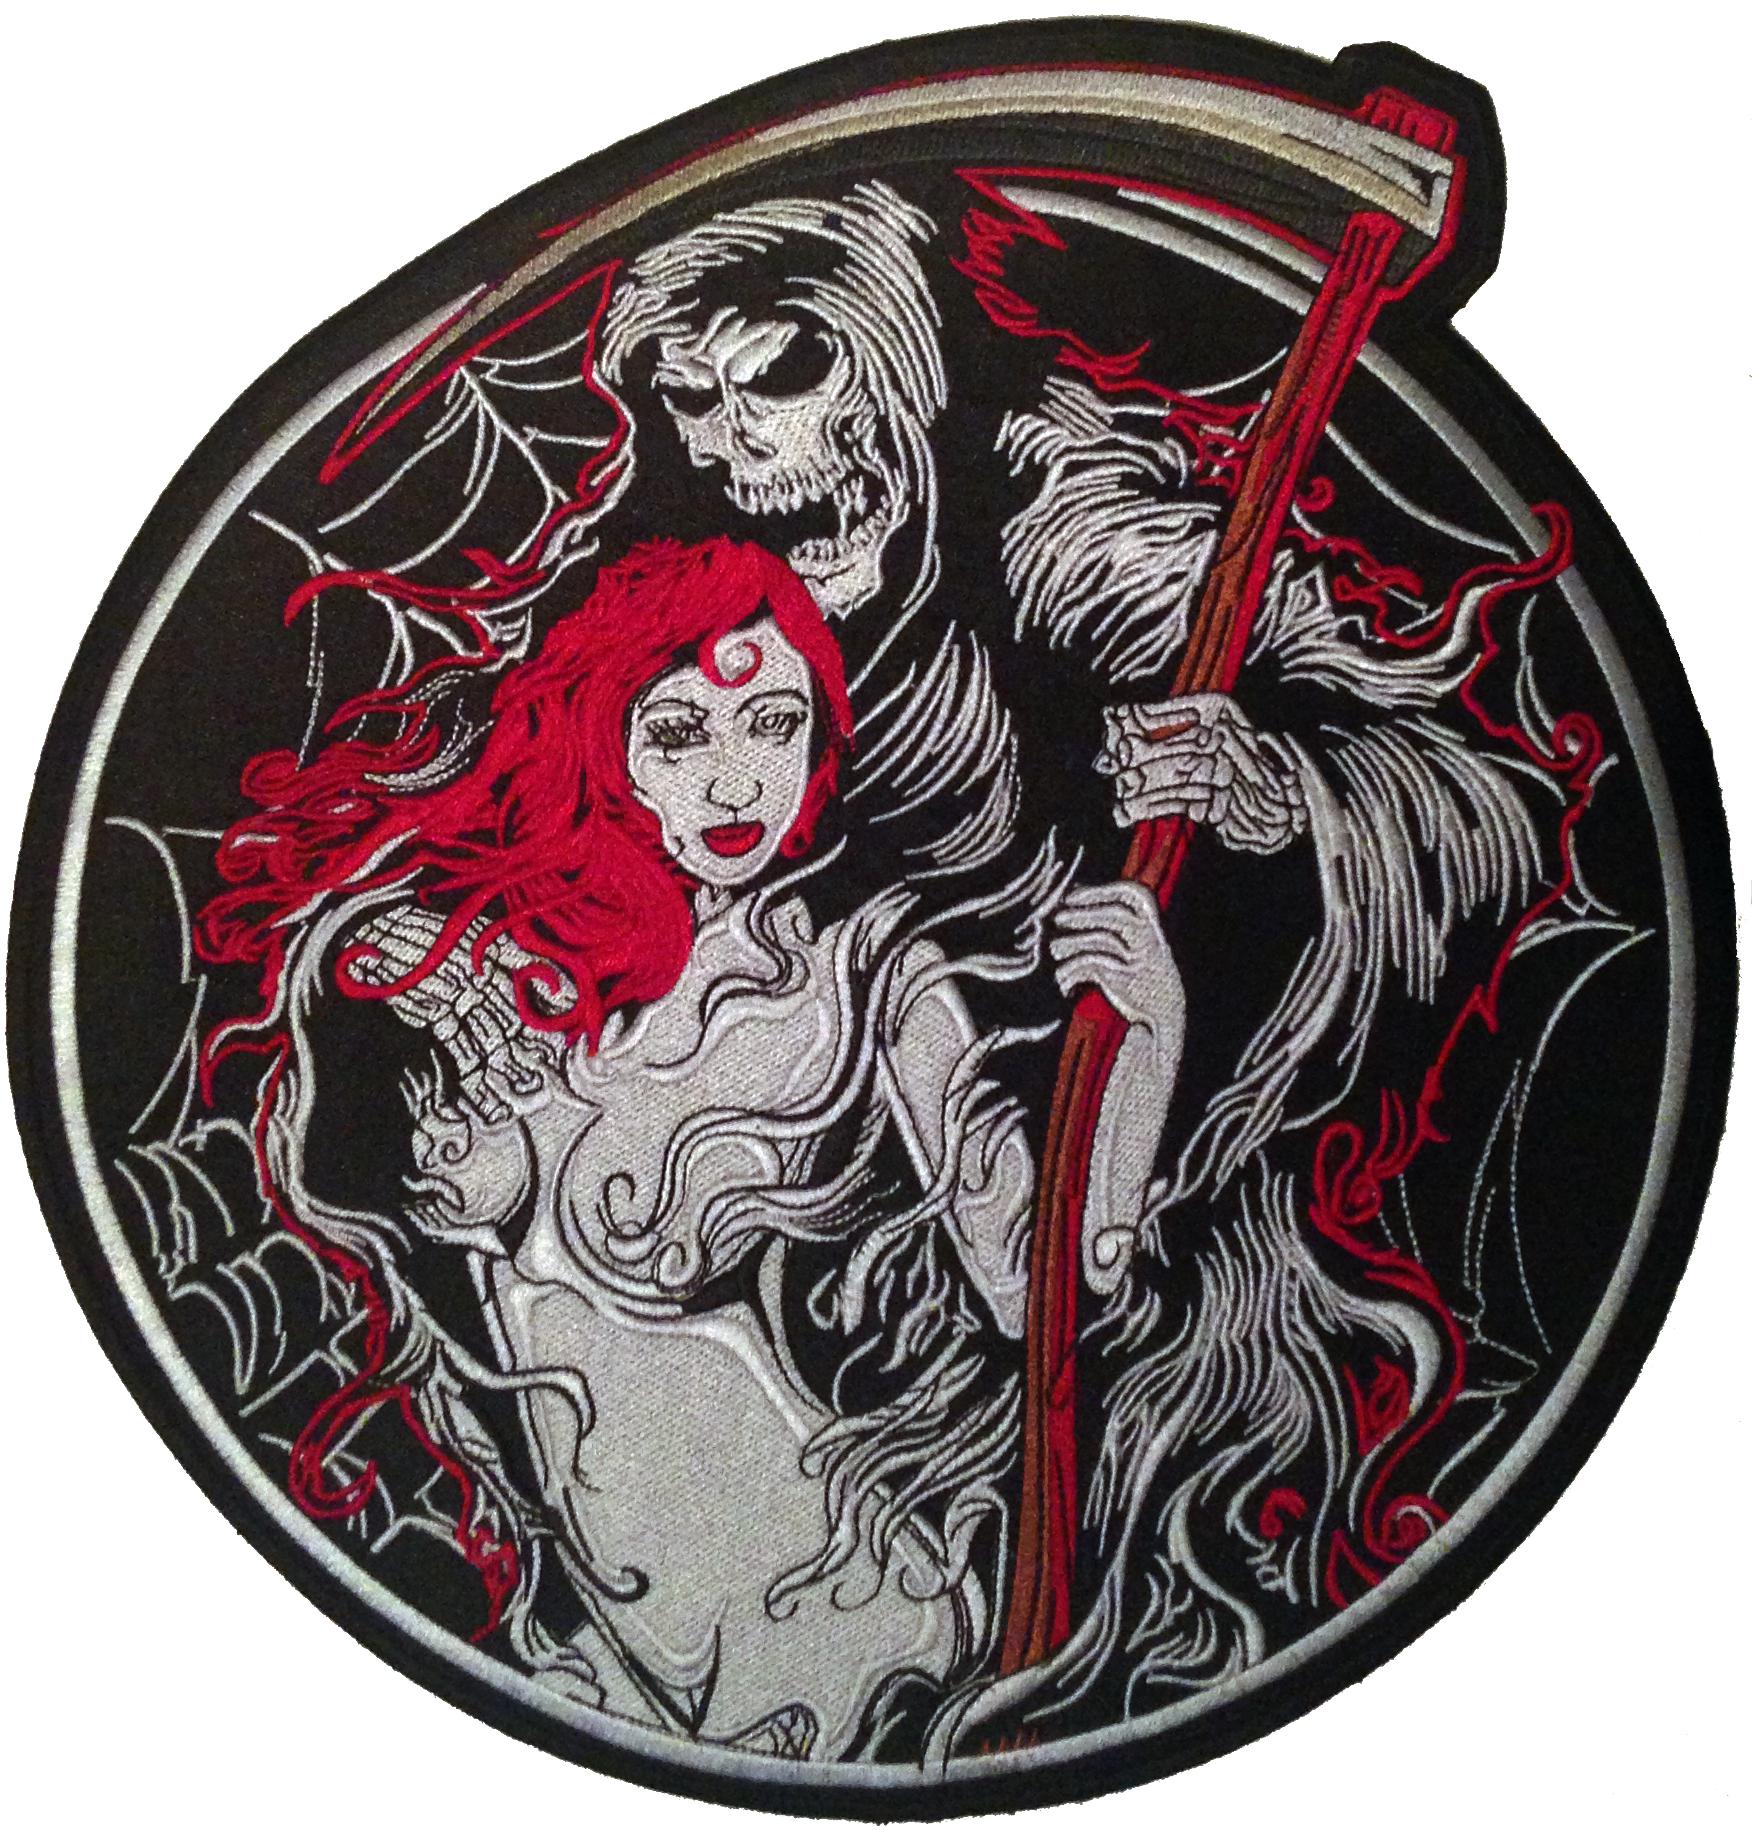 Grimm Reaper Devil Lady Sexy Girl Biker Sensenmann Deathman Rockabilly Aufnäher